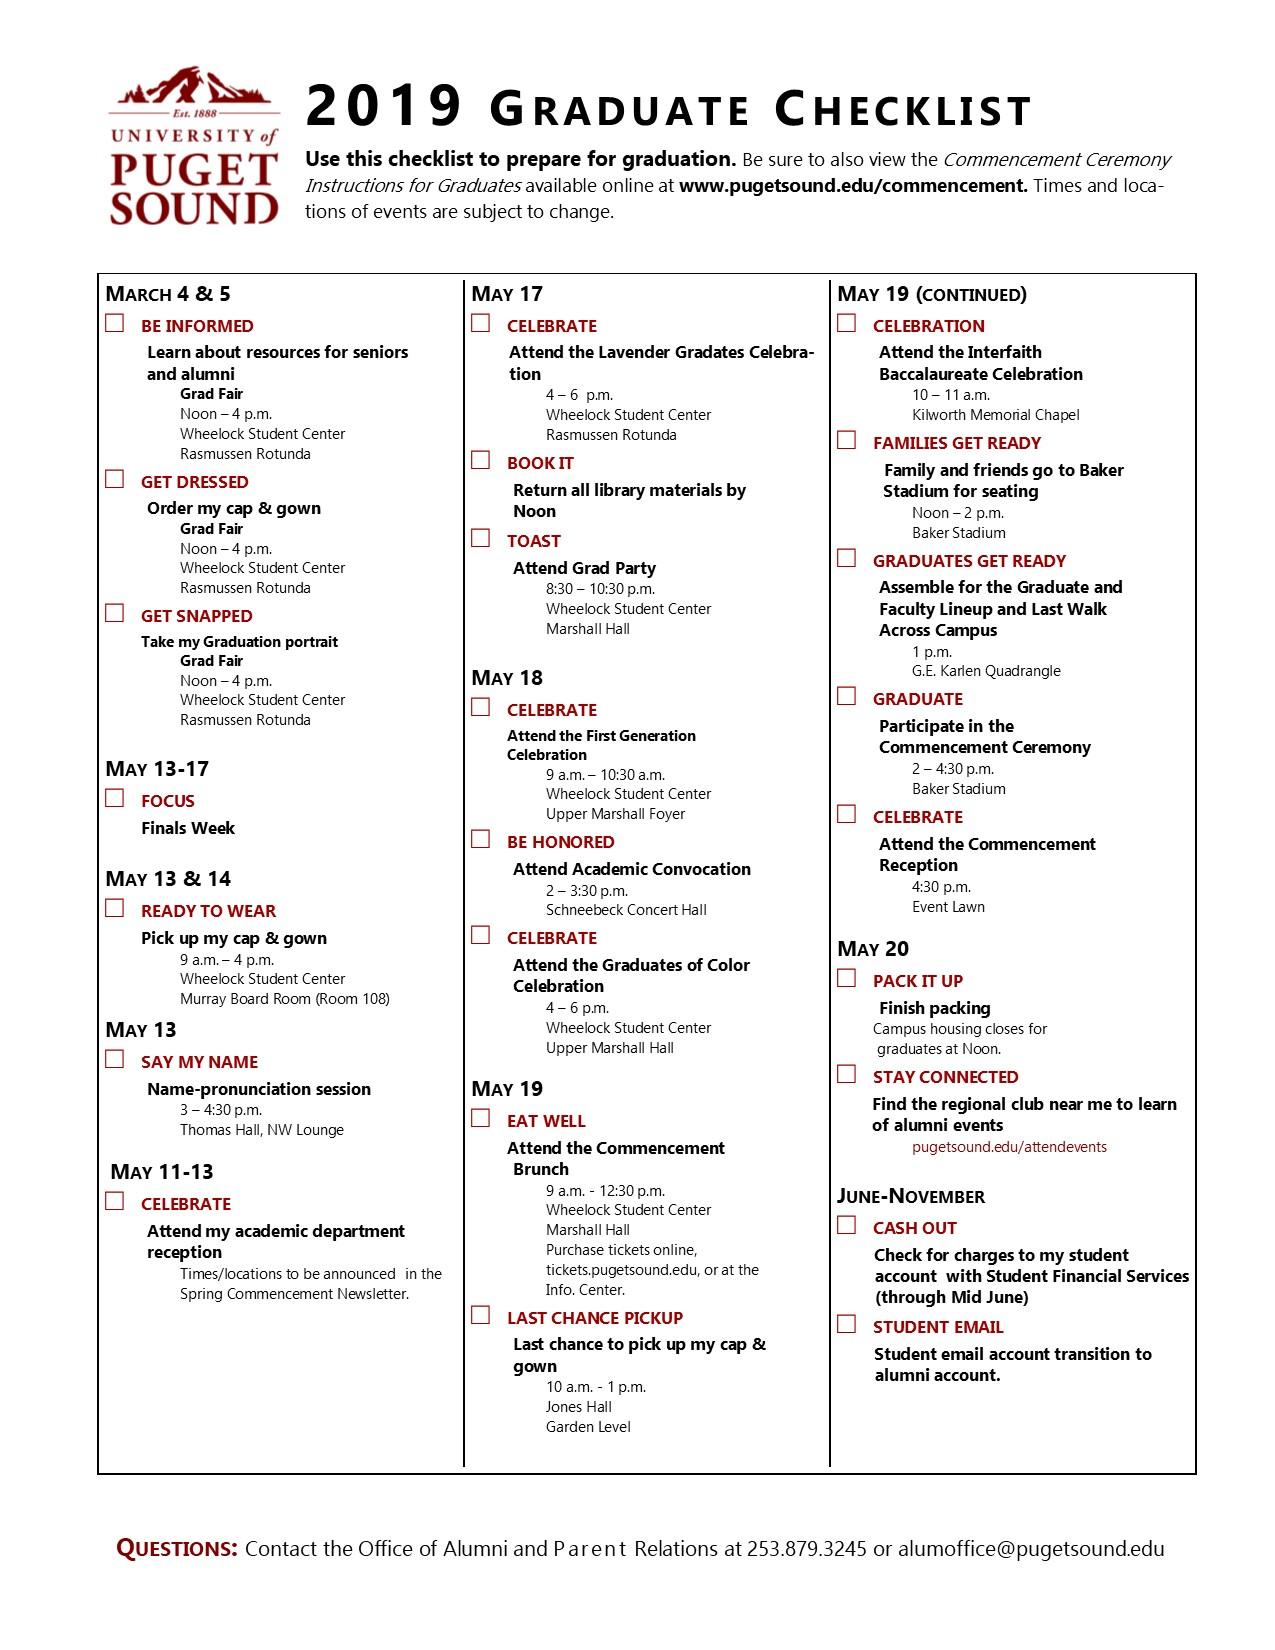 Graduate Check List · University of Puget Sound